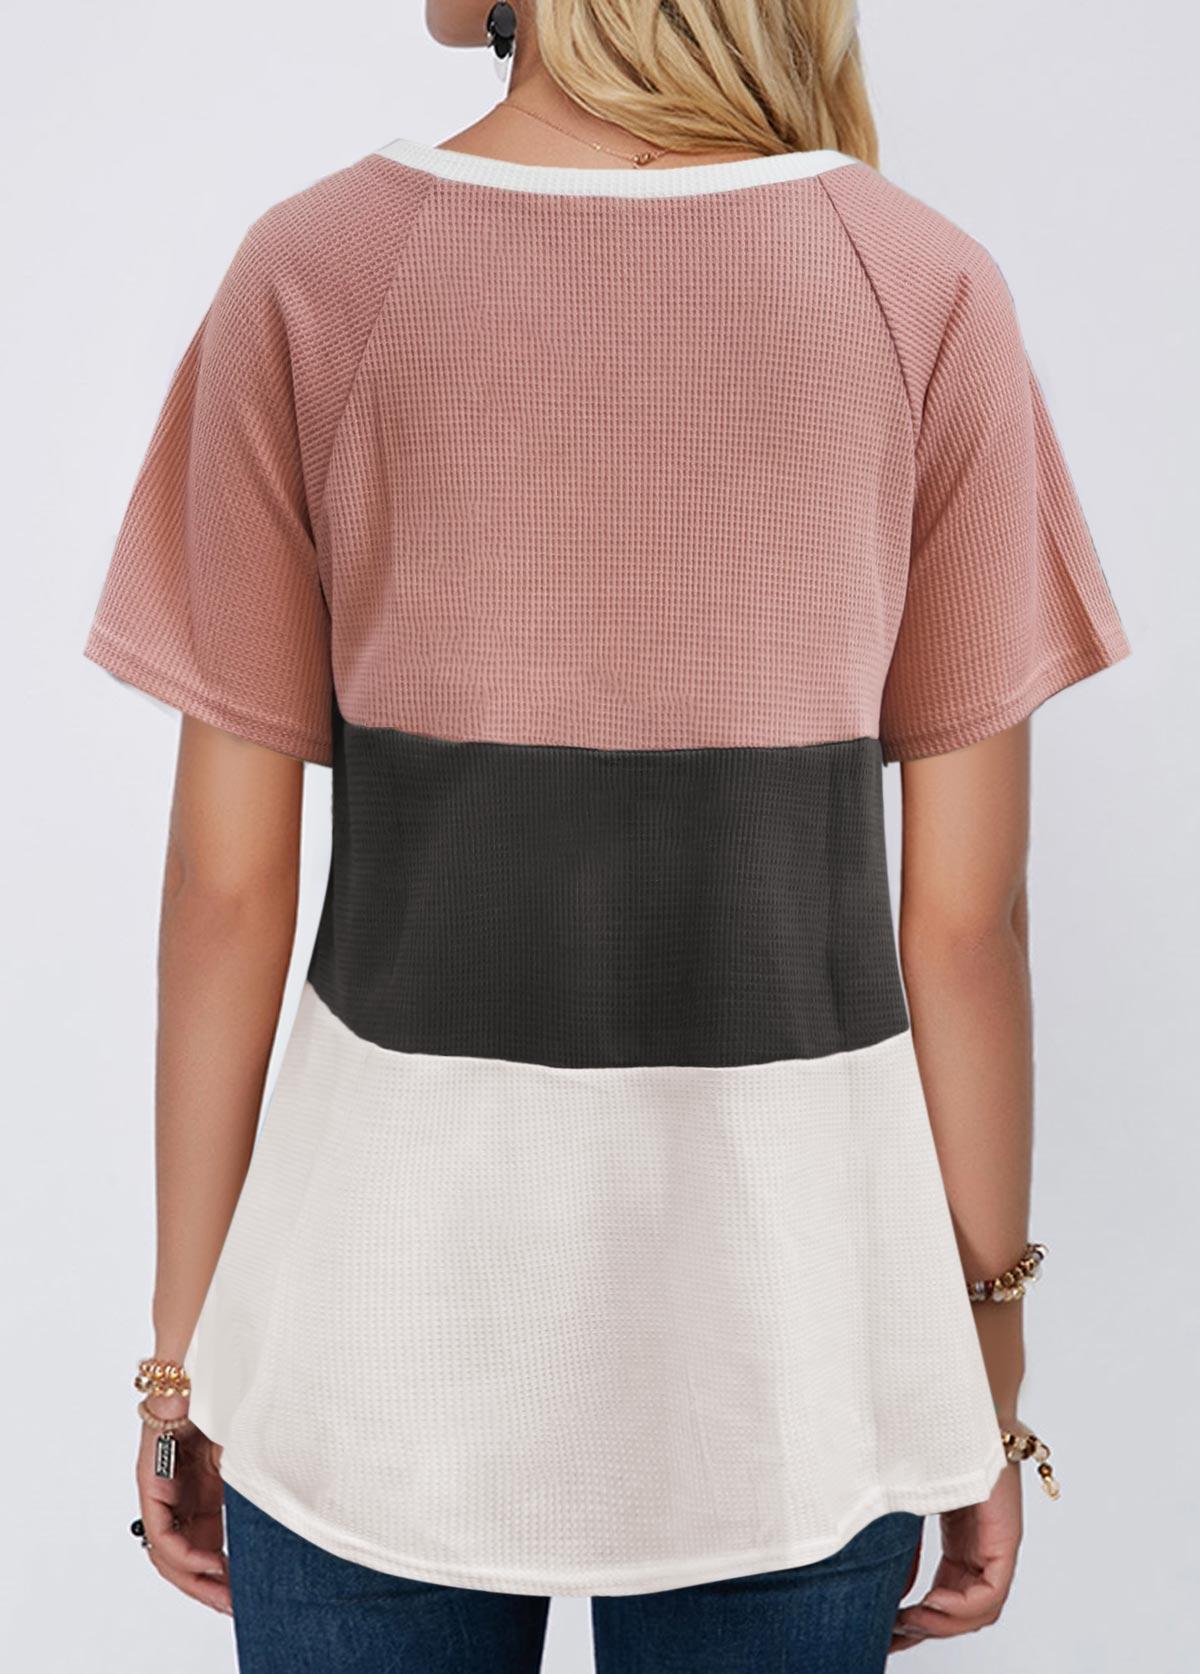 V Neck Short Sleeve Contrast T Shirt